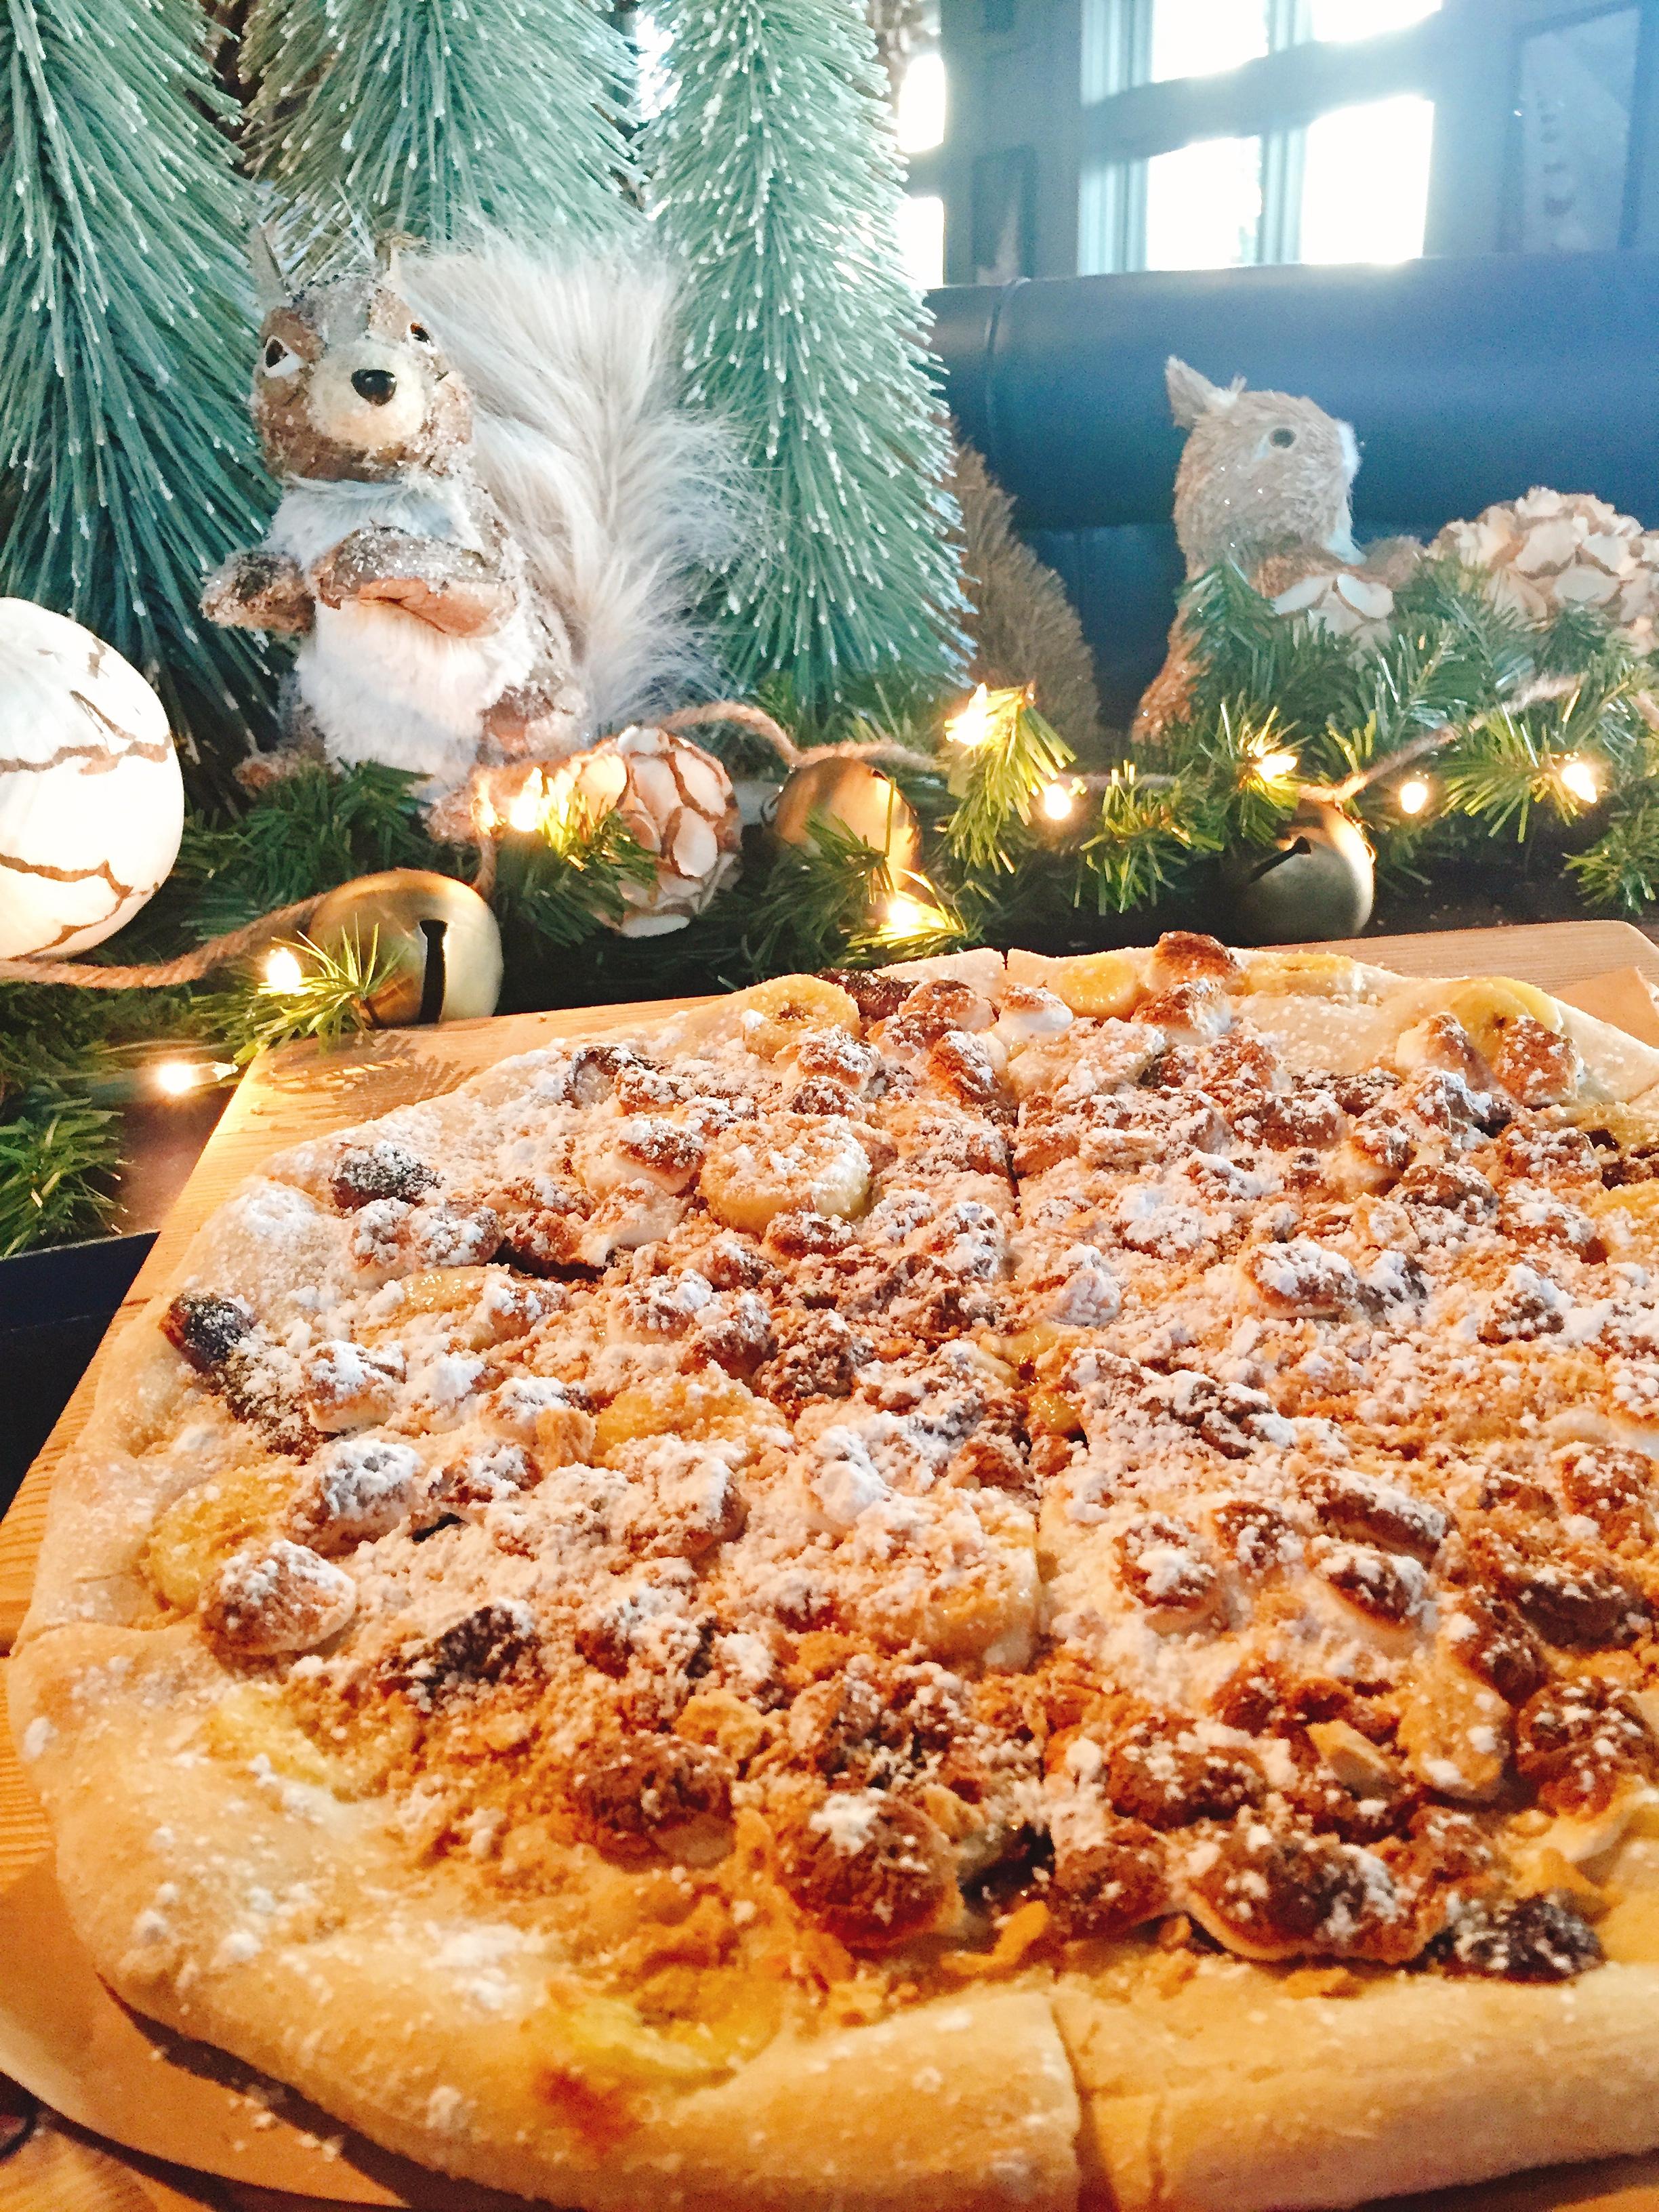 That squirrel better quit eyeballing my pizza...